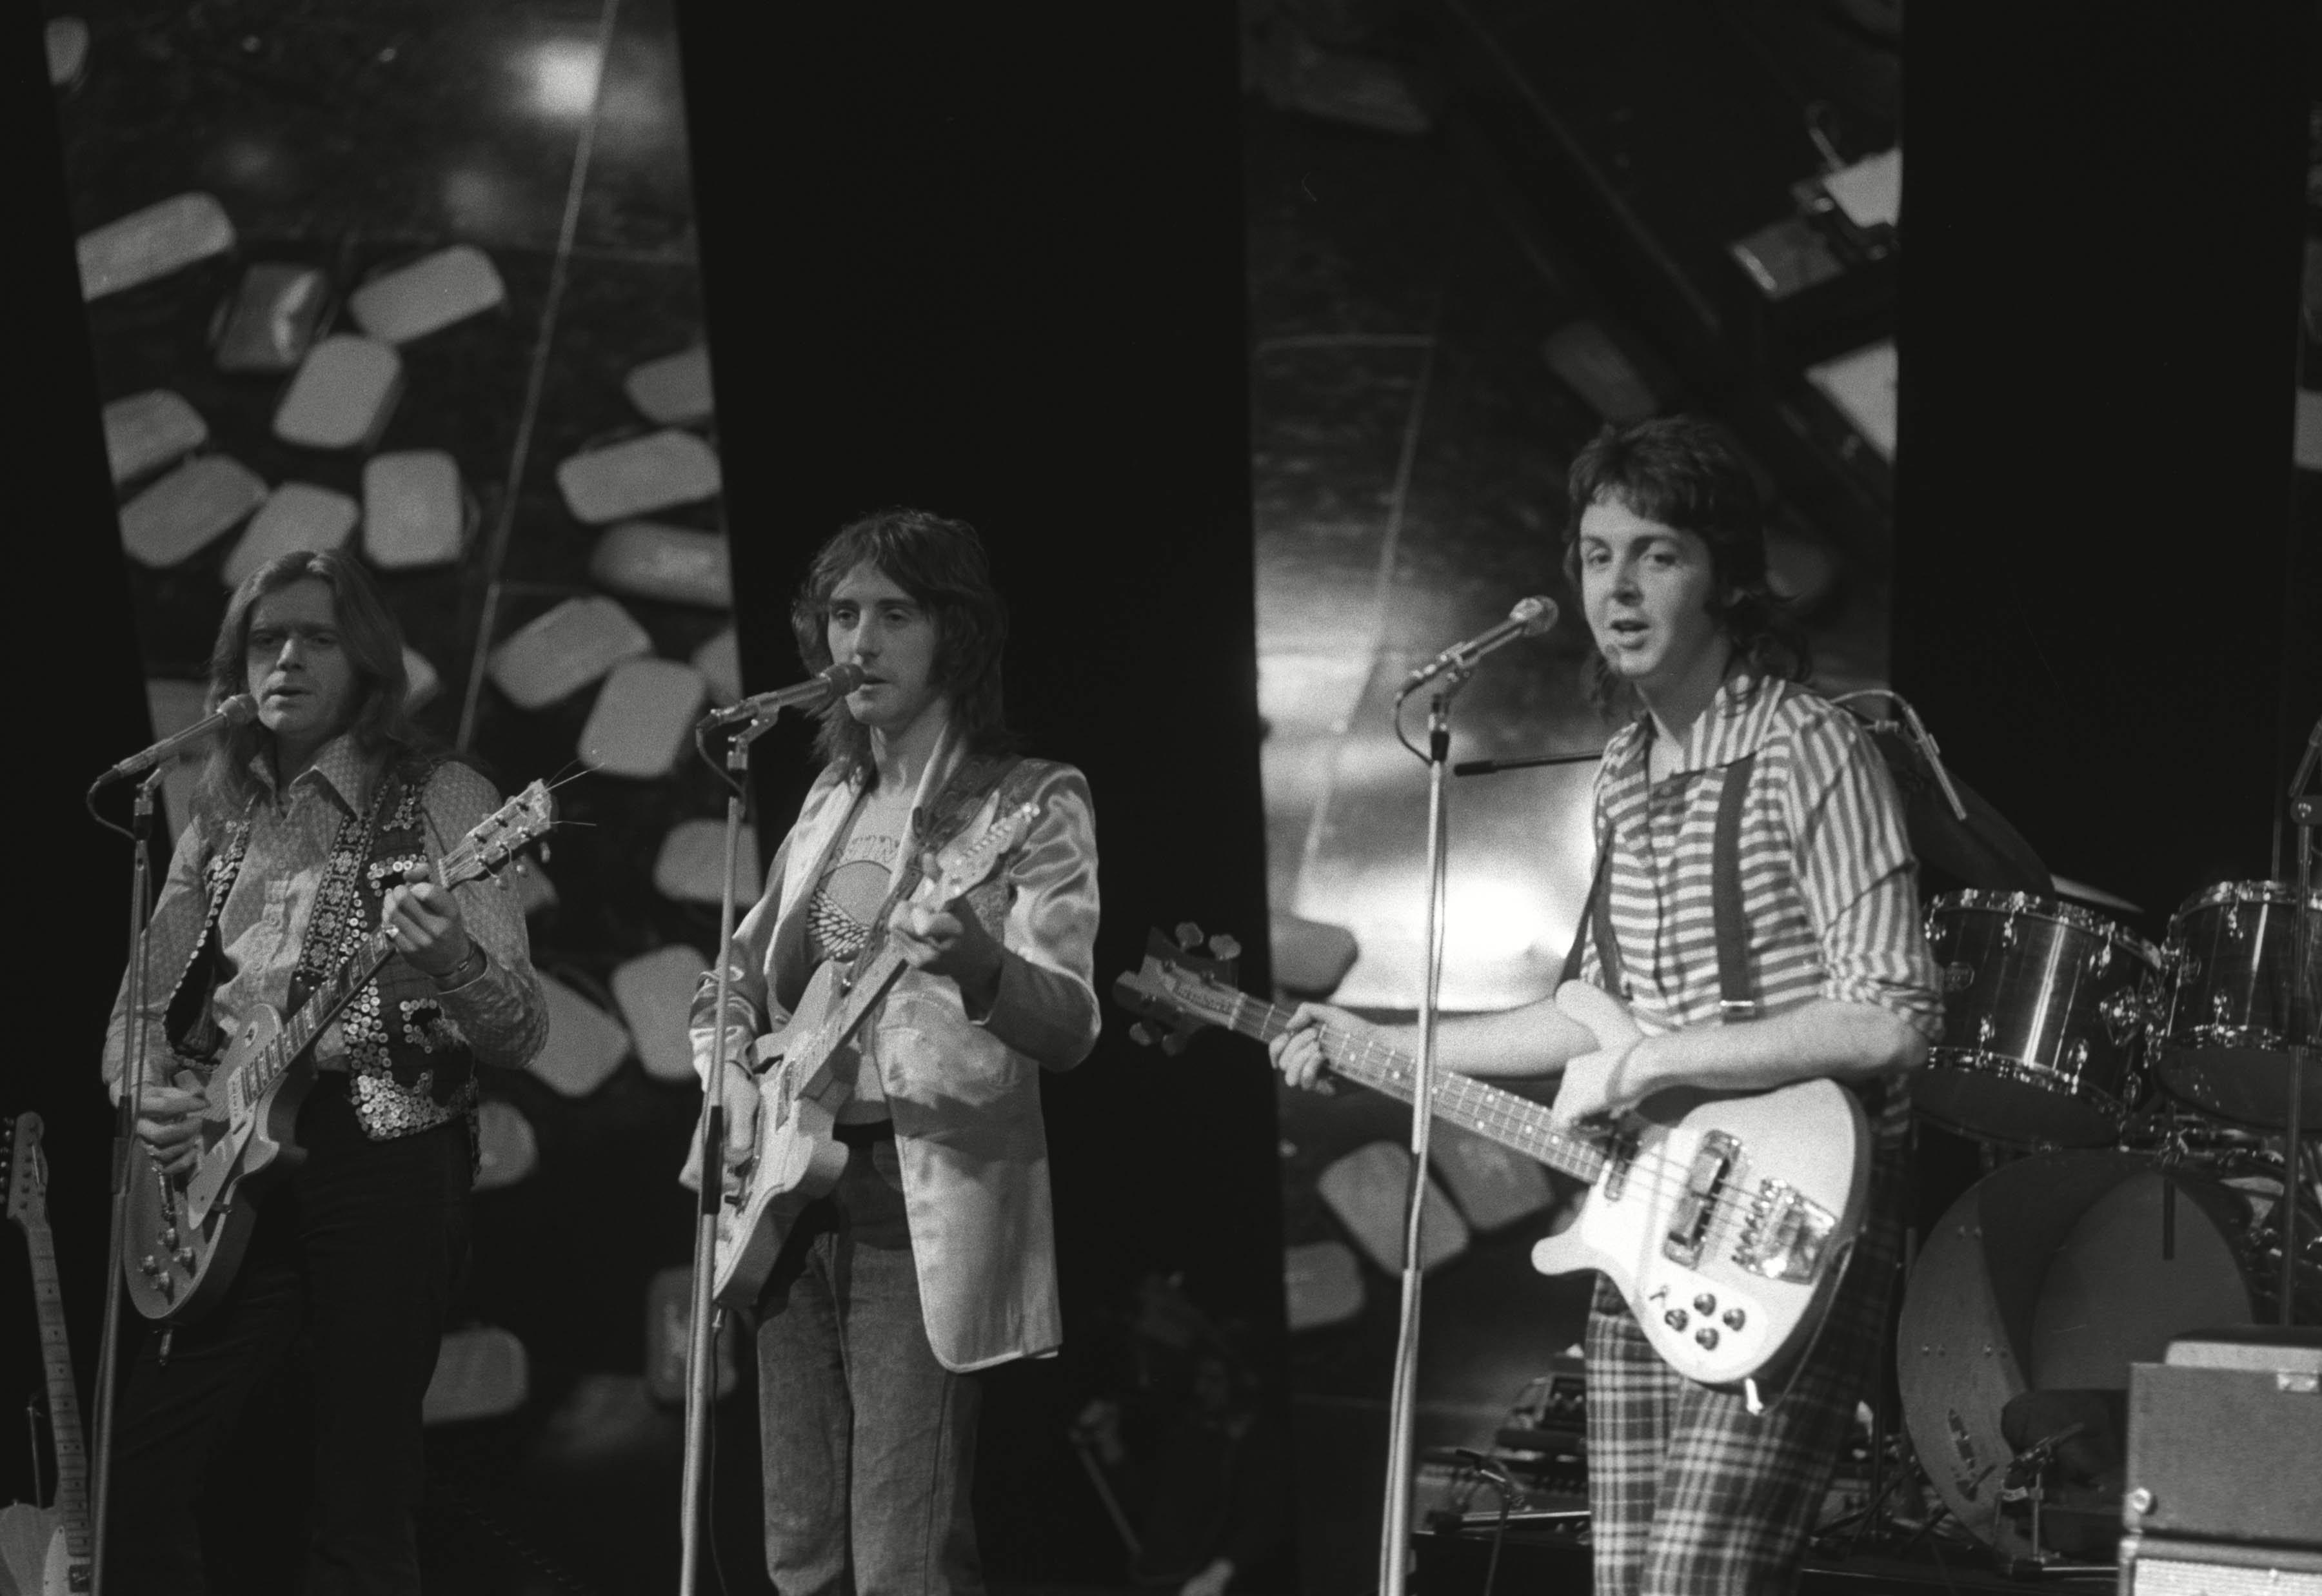 PAUL ON THE RUN: Paul McCartney Announces Massive Reissues